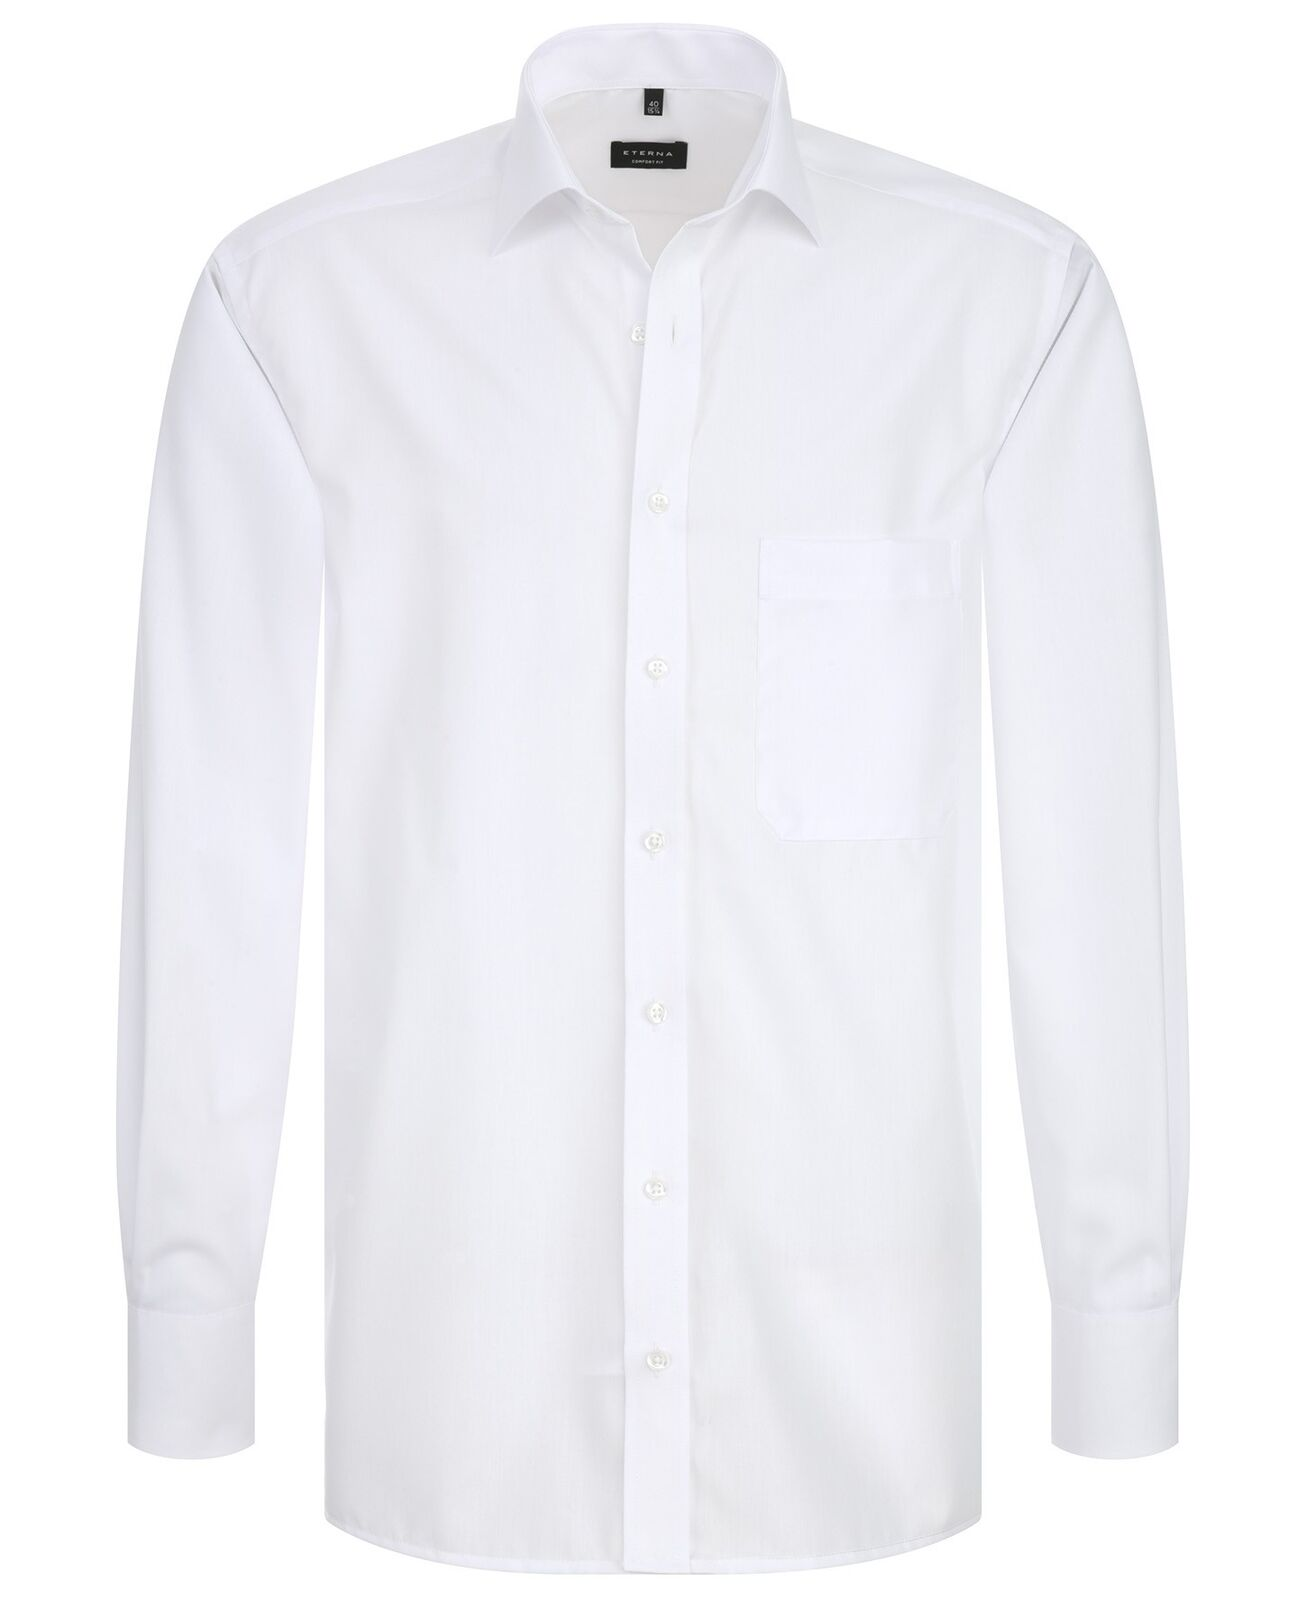 Eterna-Comfort fit-Uomo Camicia Manica Lunga Vers. colorei, Kent colletto (1100 e187)